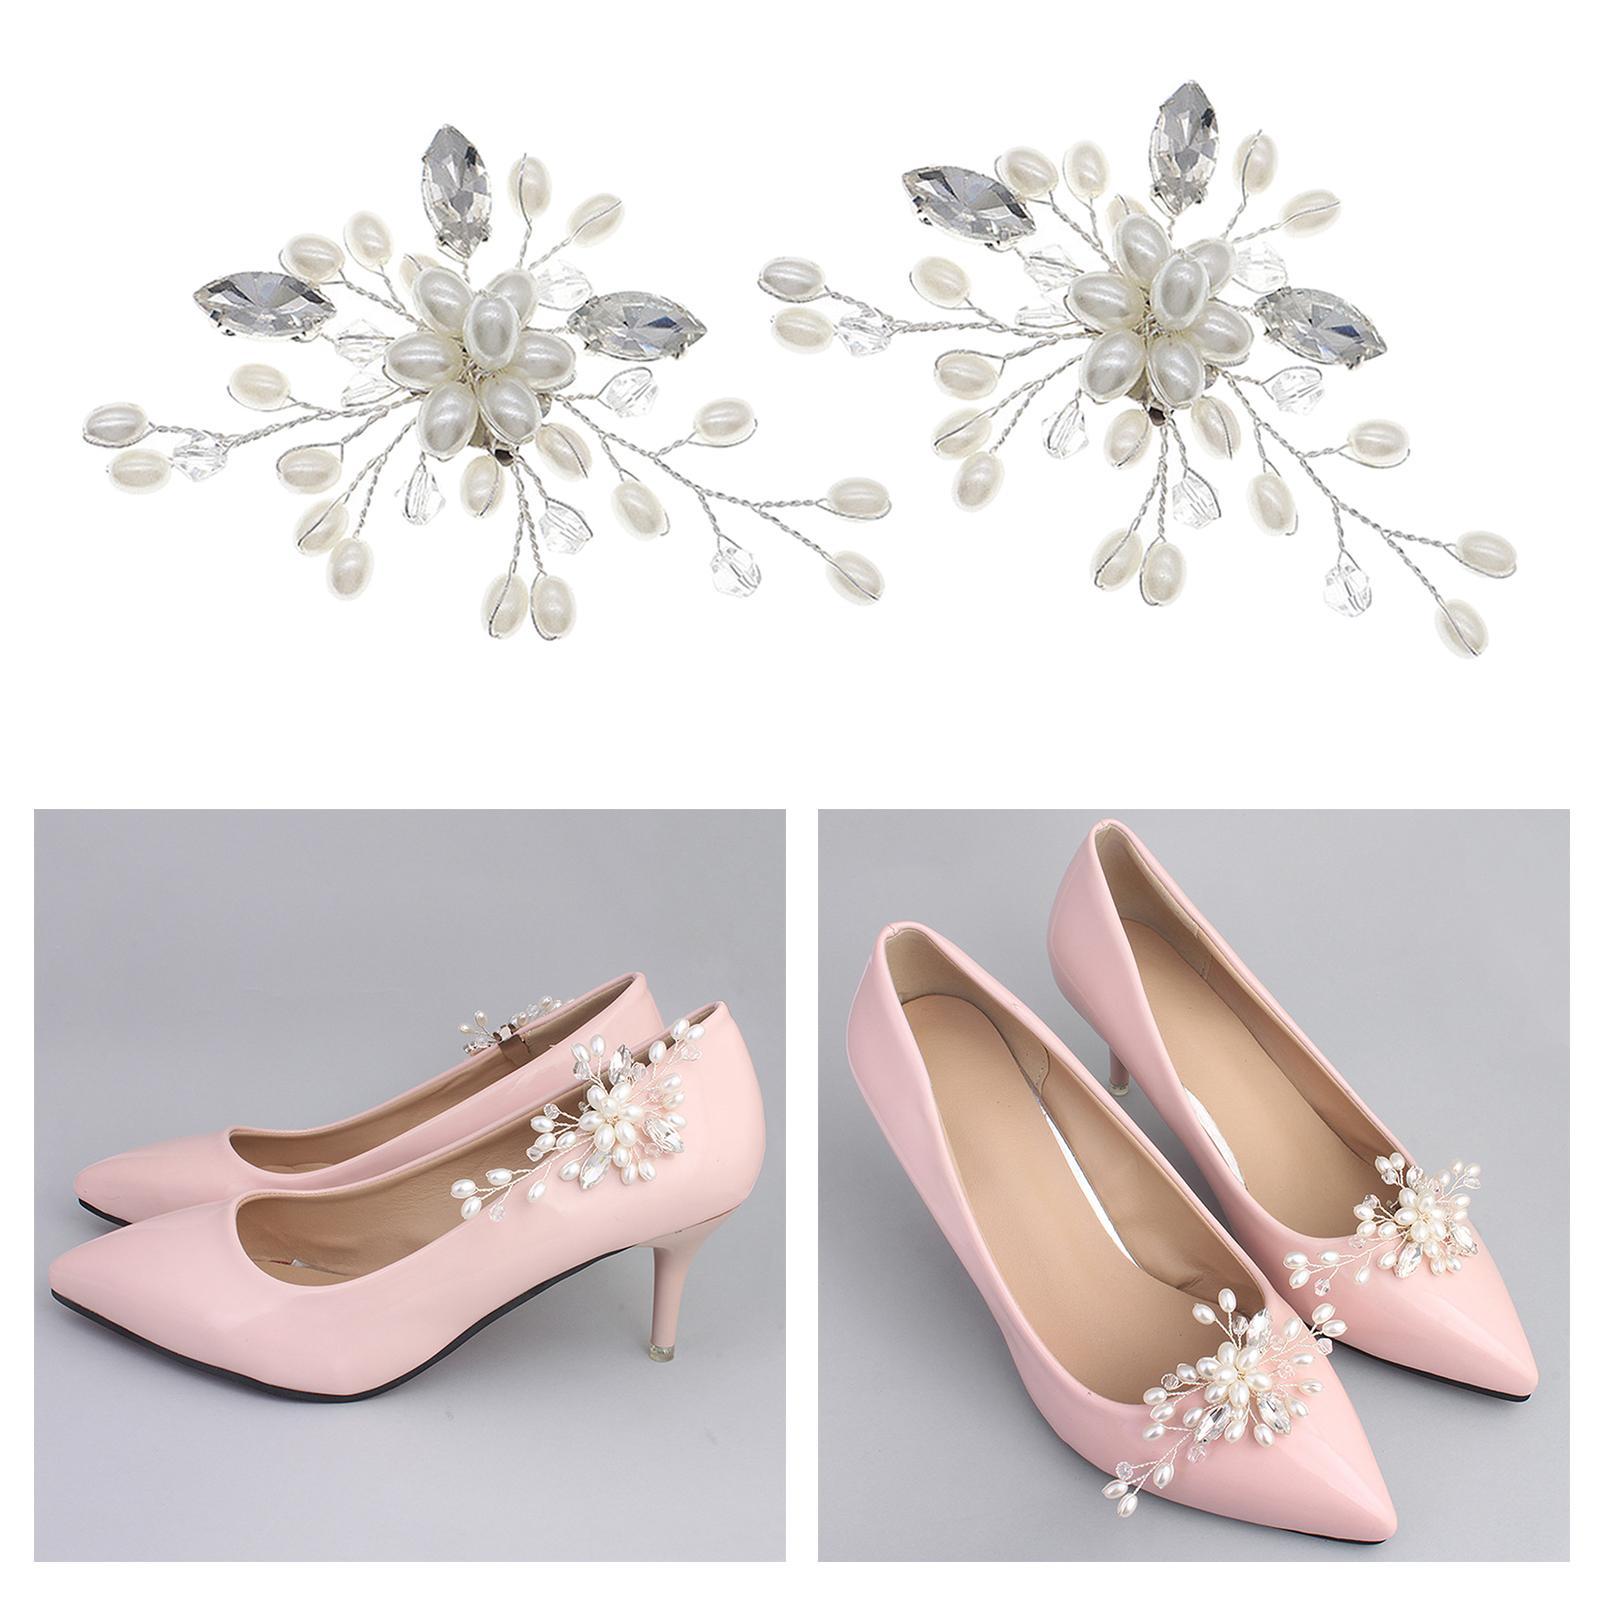 Set of 2 Shoe Clips Women Weddings Party High Heel Shoe Charms Buckle Decor